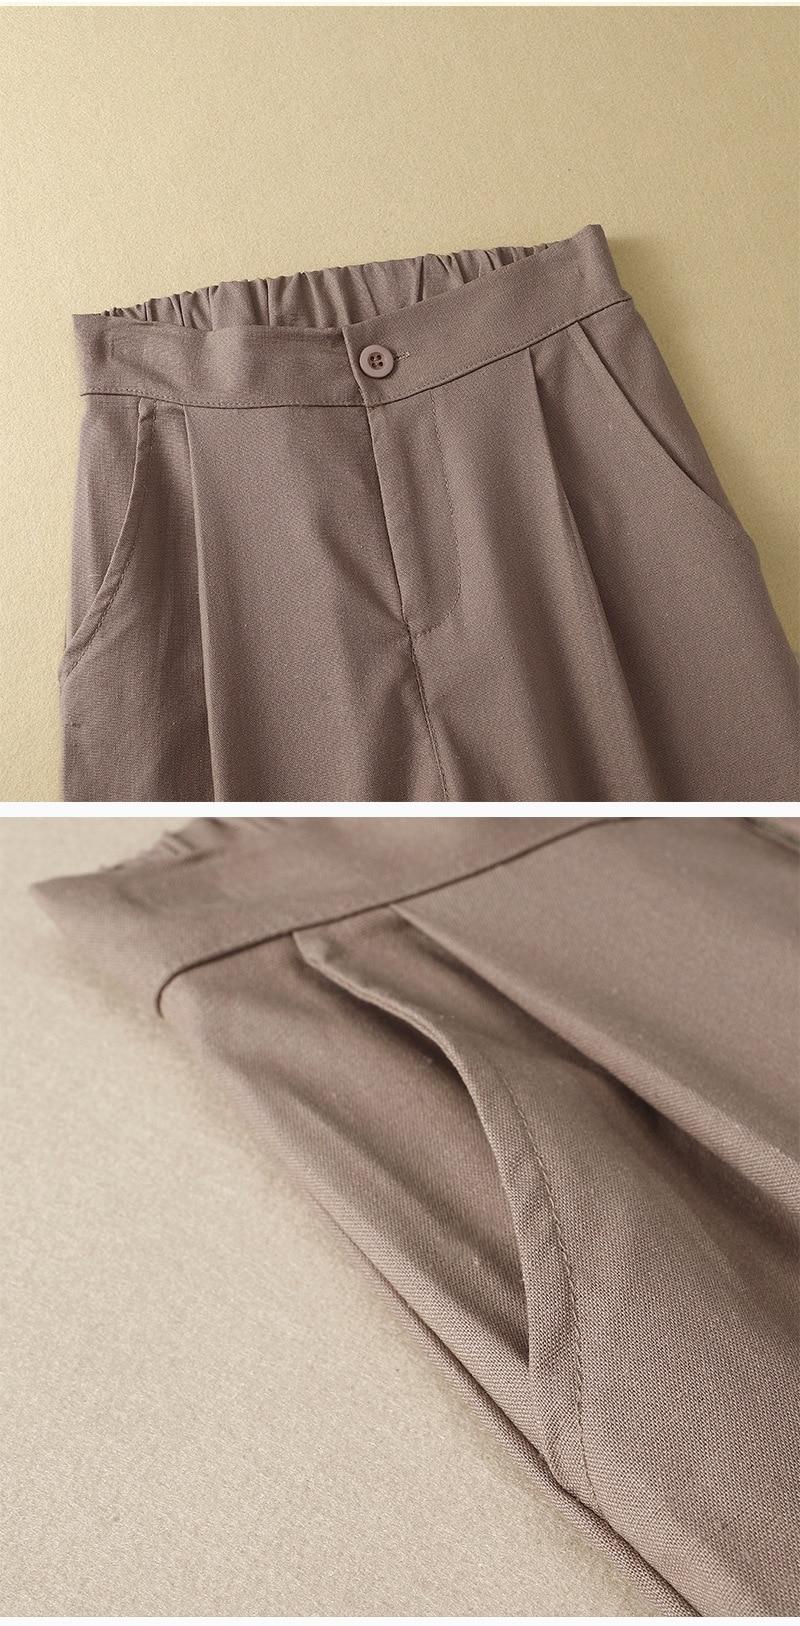 Women's 100%Pure Linen Cotton Pants Capri Vintage Casual Waisted Classic Harem Pants for Women Summer White Calf-length Trousers